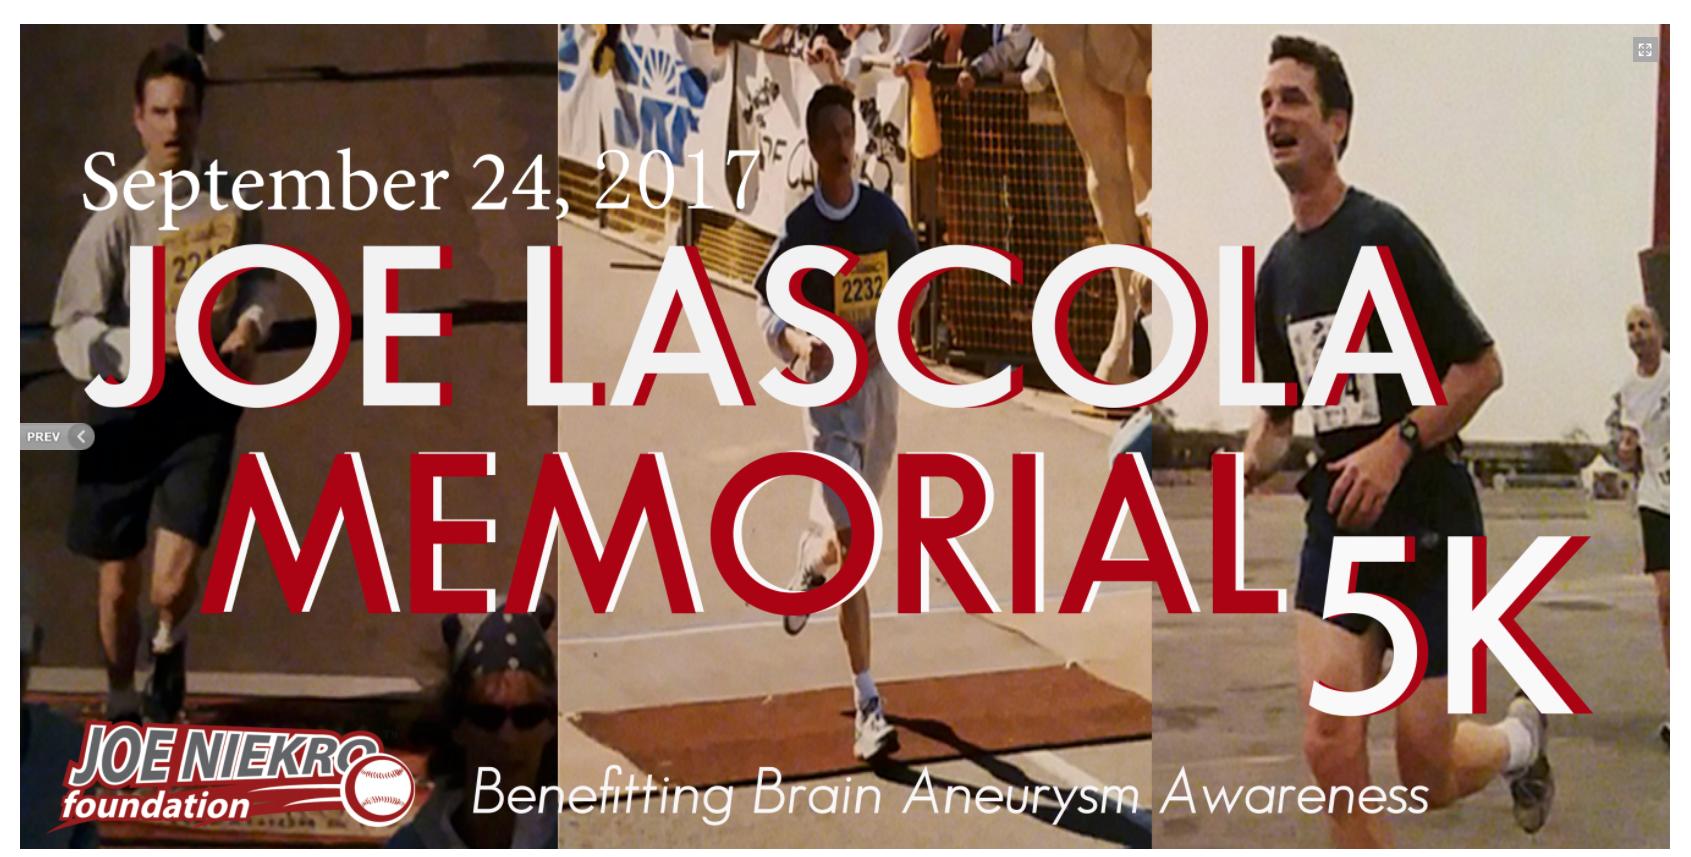 https://www.joeniekrofoundation.com/past-events/pastevents2017/joe-lascola-memorial-walk/attachment/untitled-1/